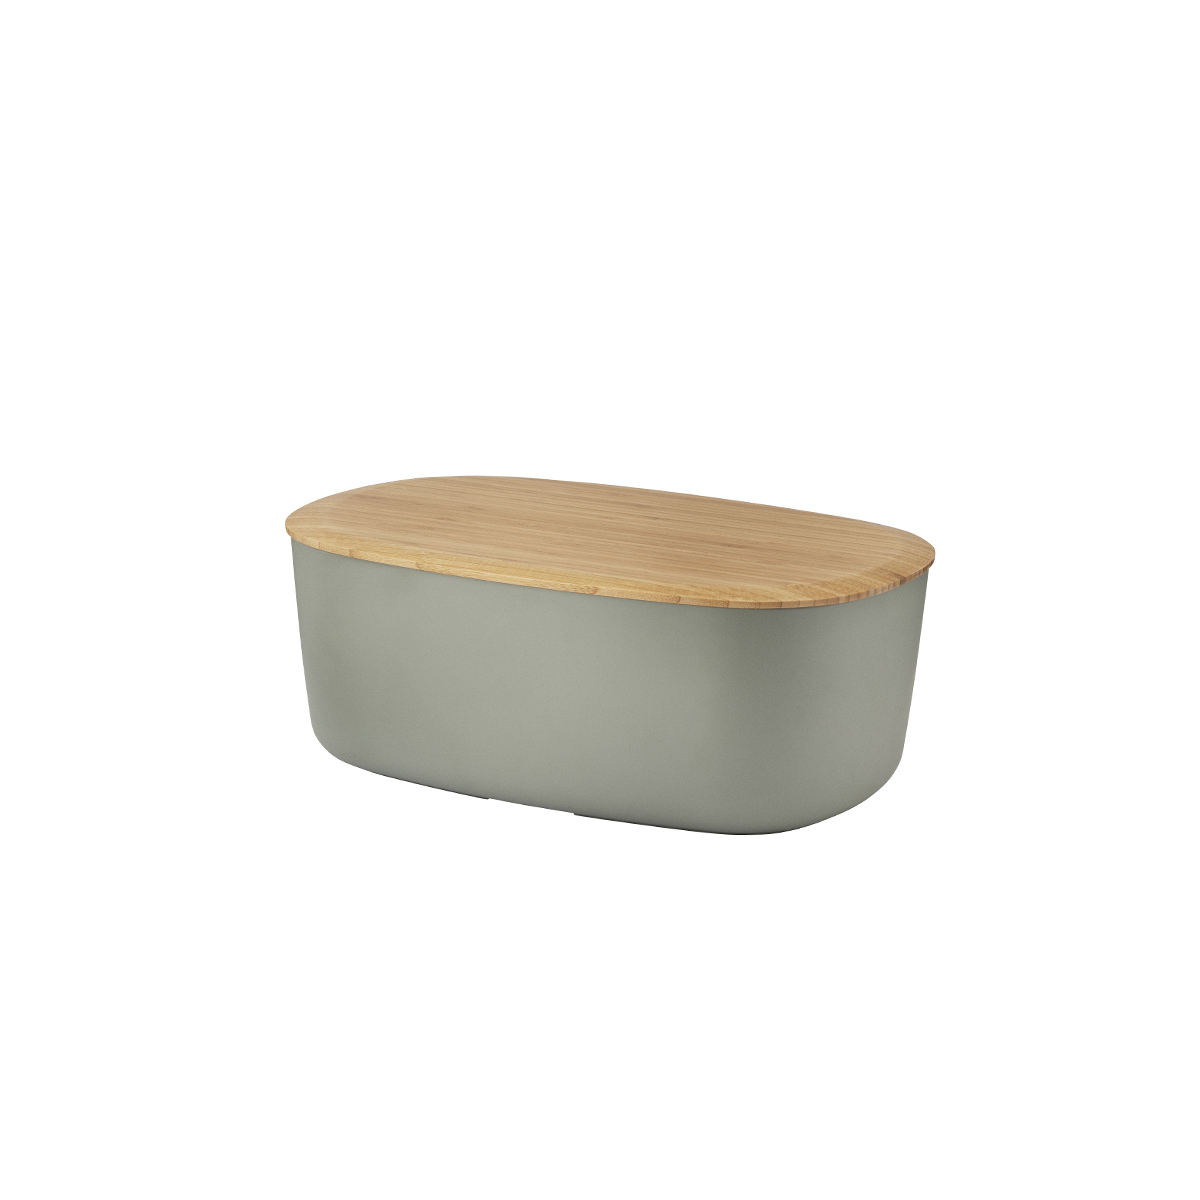 BOX_Z00038-3_BOX-IT_bread_box_warm_grey